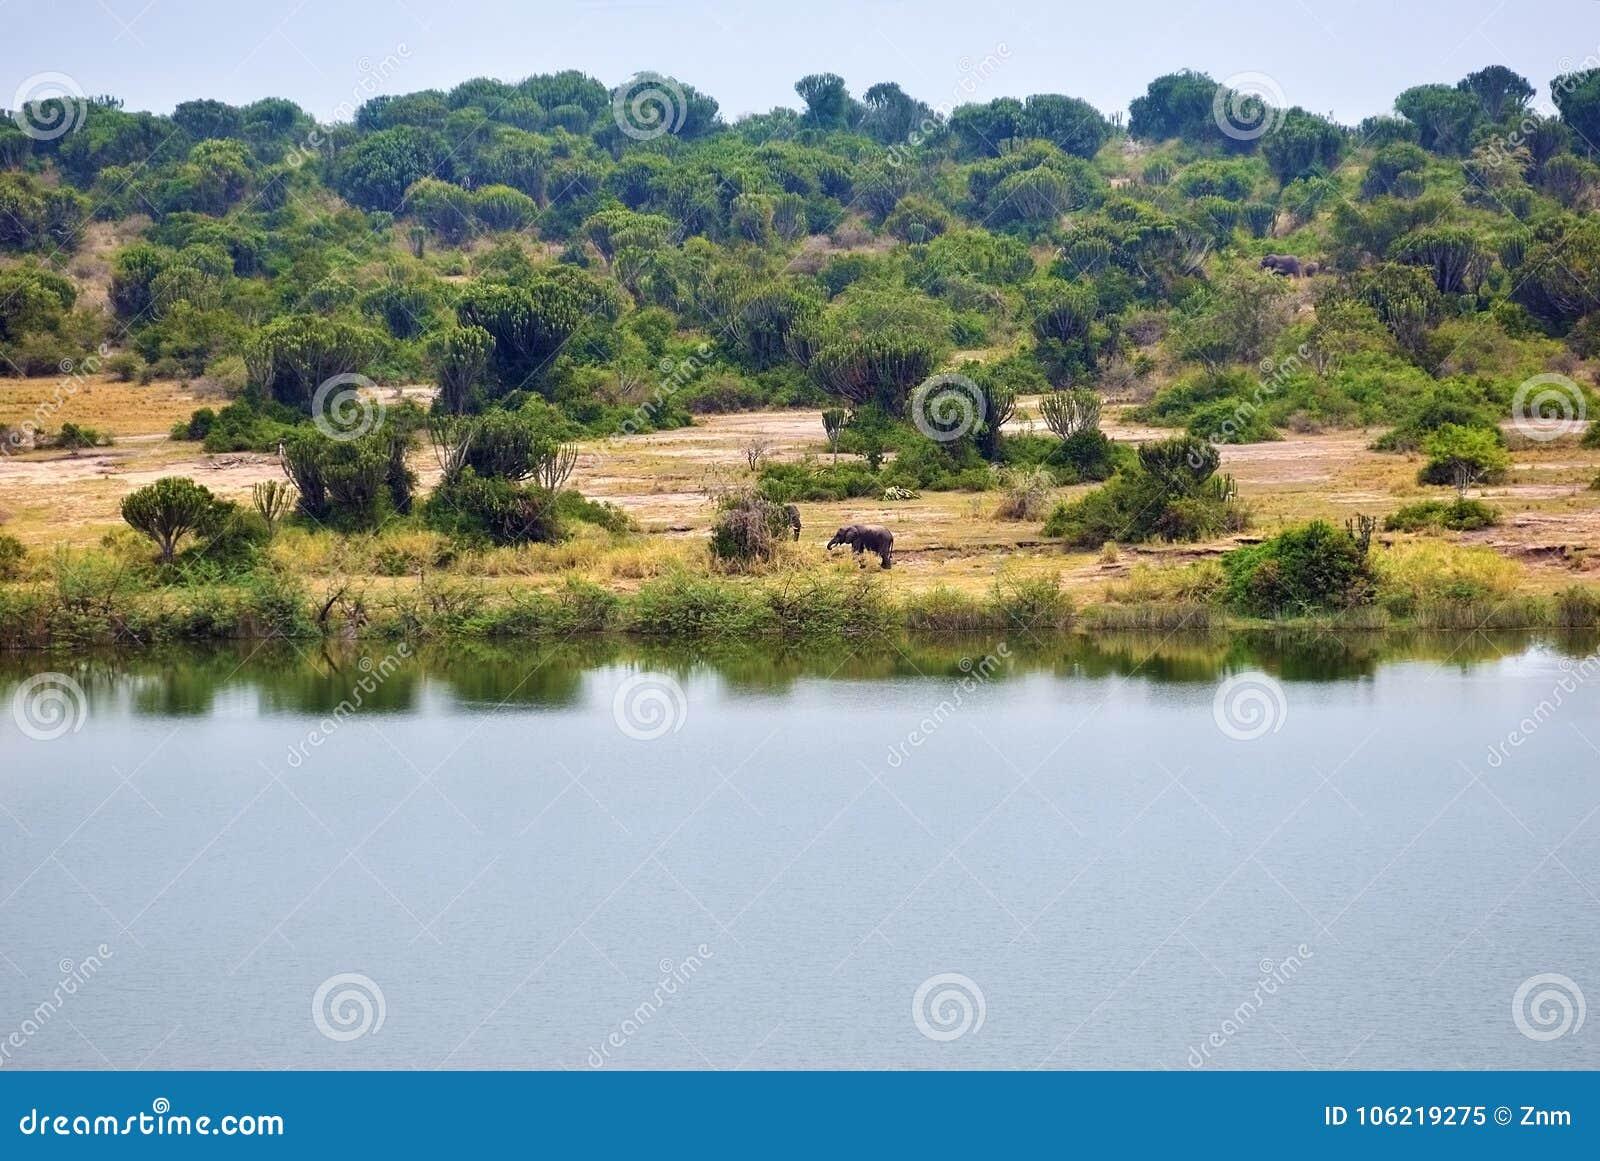 Lake George in Uganda